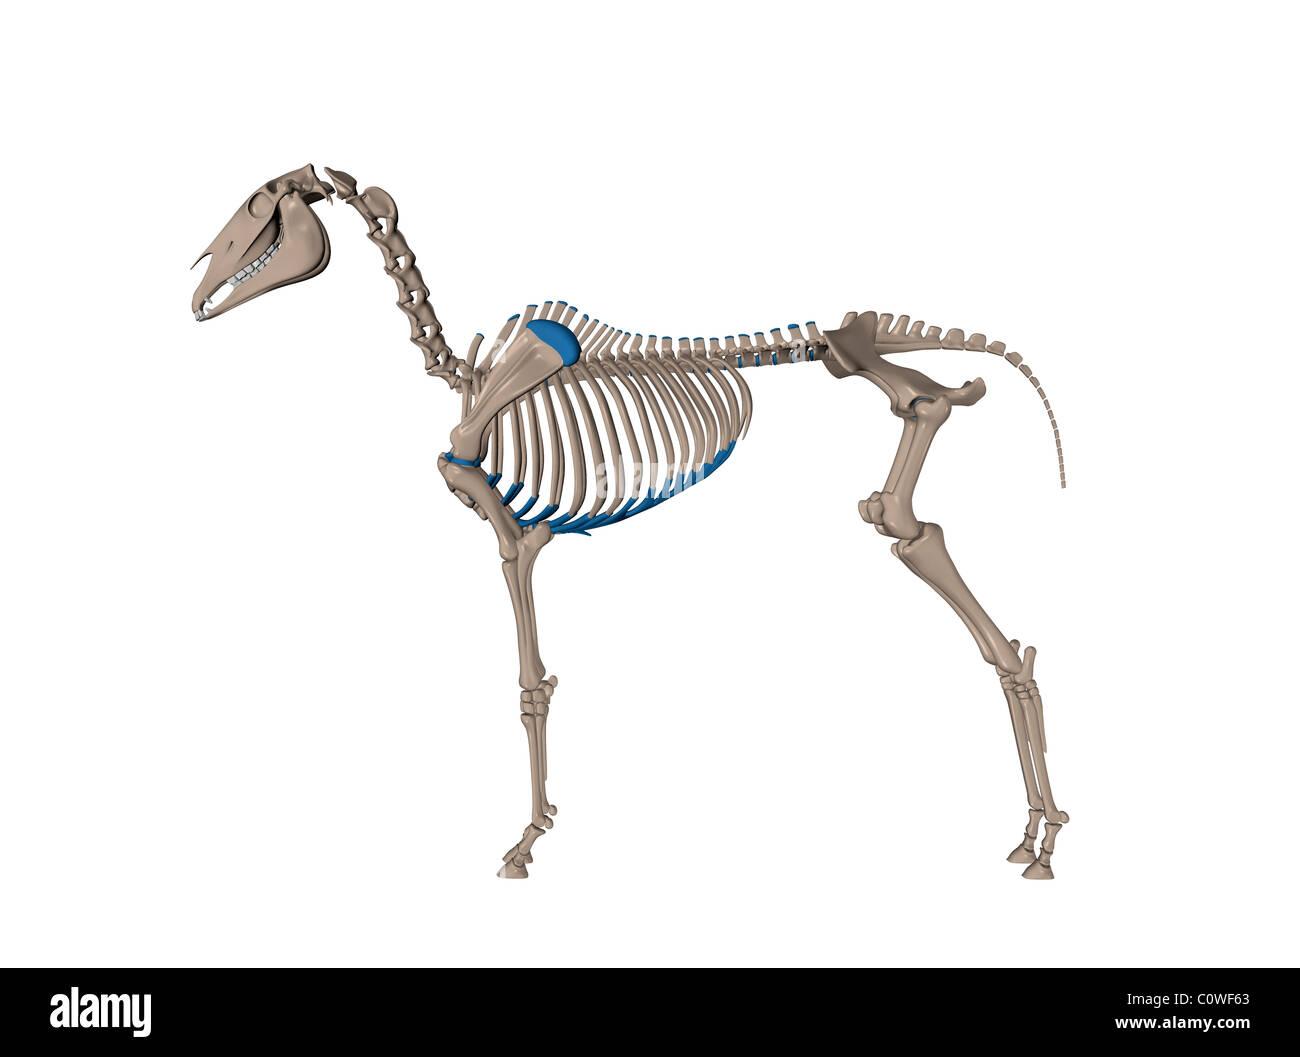 Anatomía del caballo esqueleto Foto & Imagen De Stock: 34981467 - Alamy